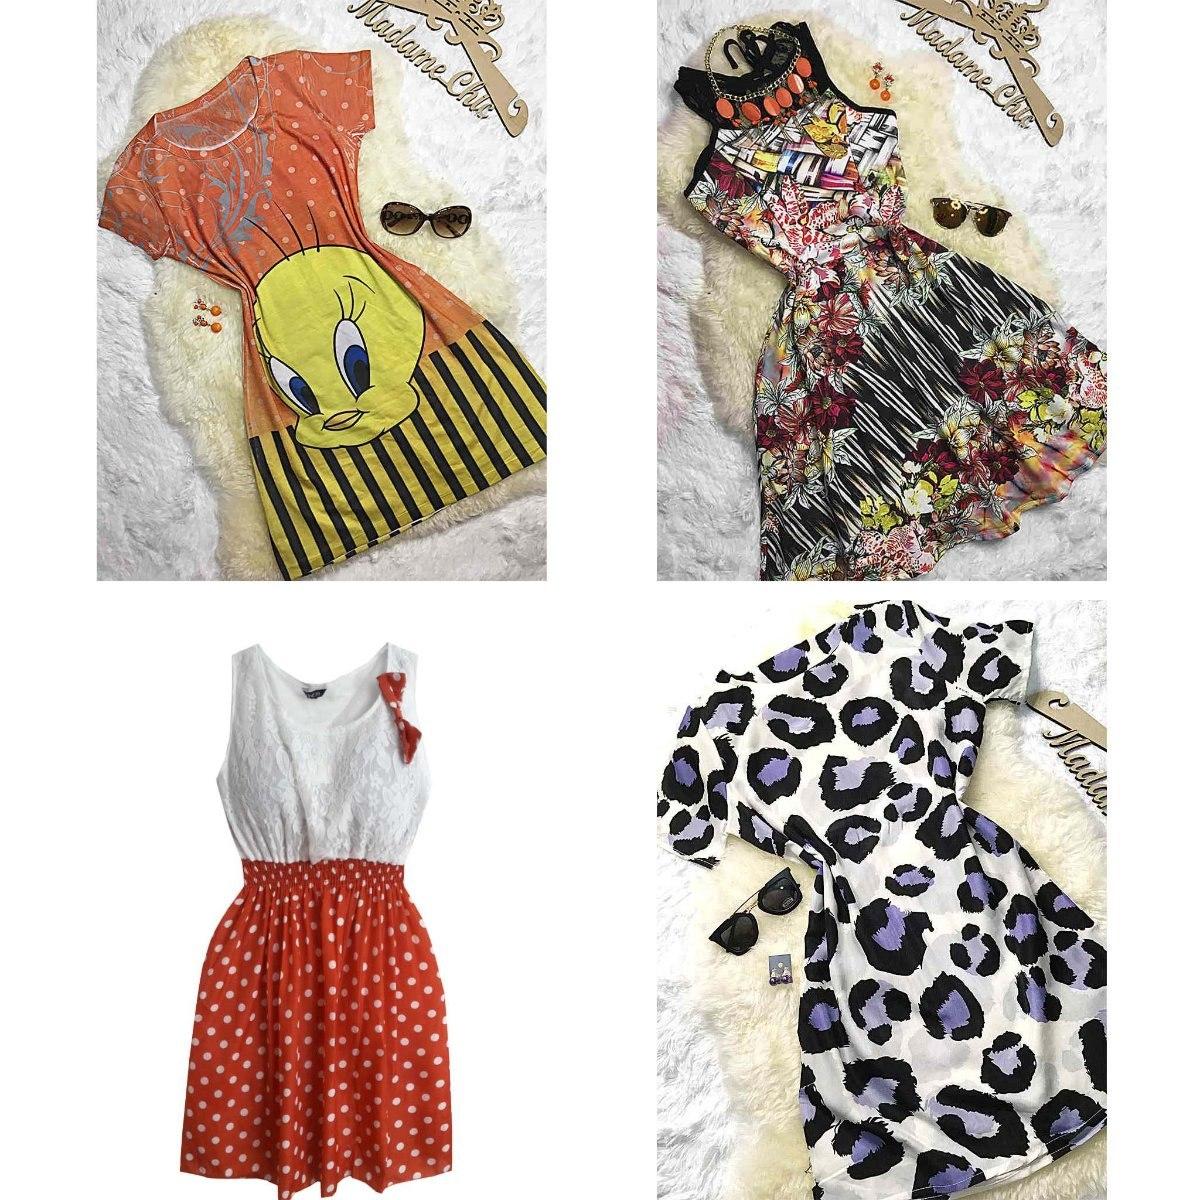 atacado de roupas online vestidos femininos lote 4 peças. Carregando zoom. c6a3a969aab